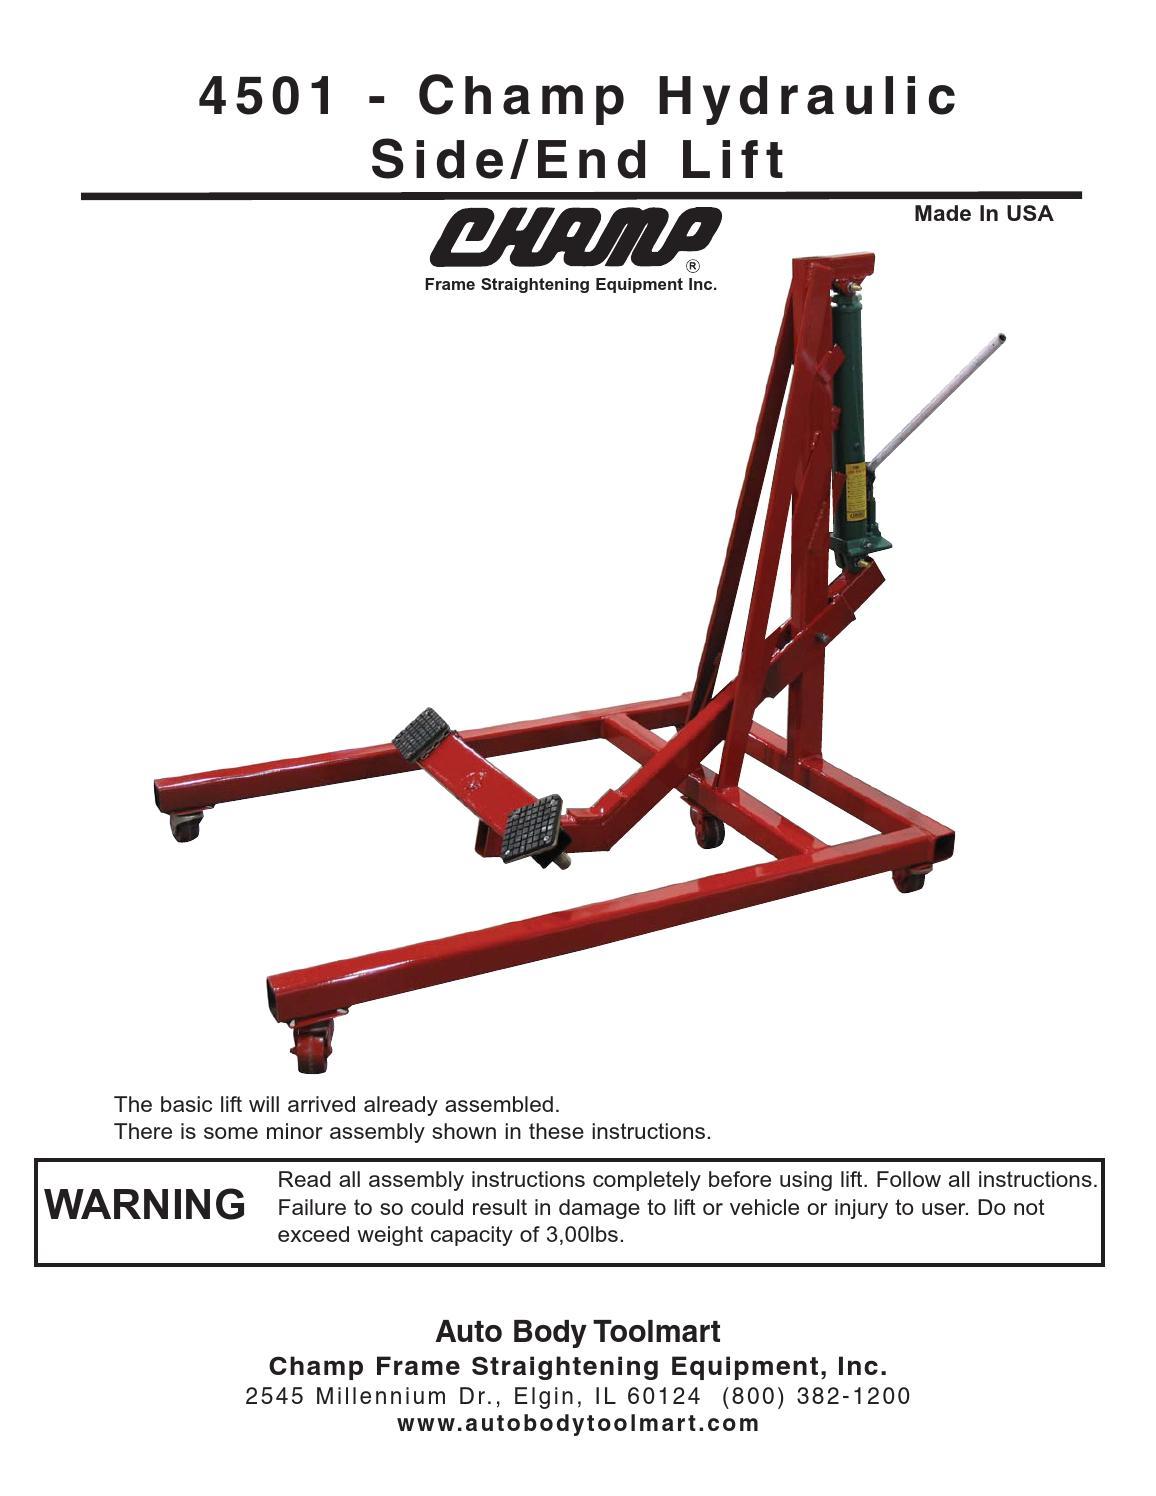 4501 Champ Hydraulic Side End Lift By Auto Body Toolmart